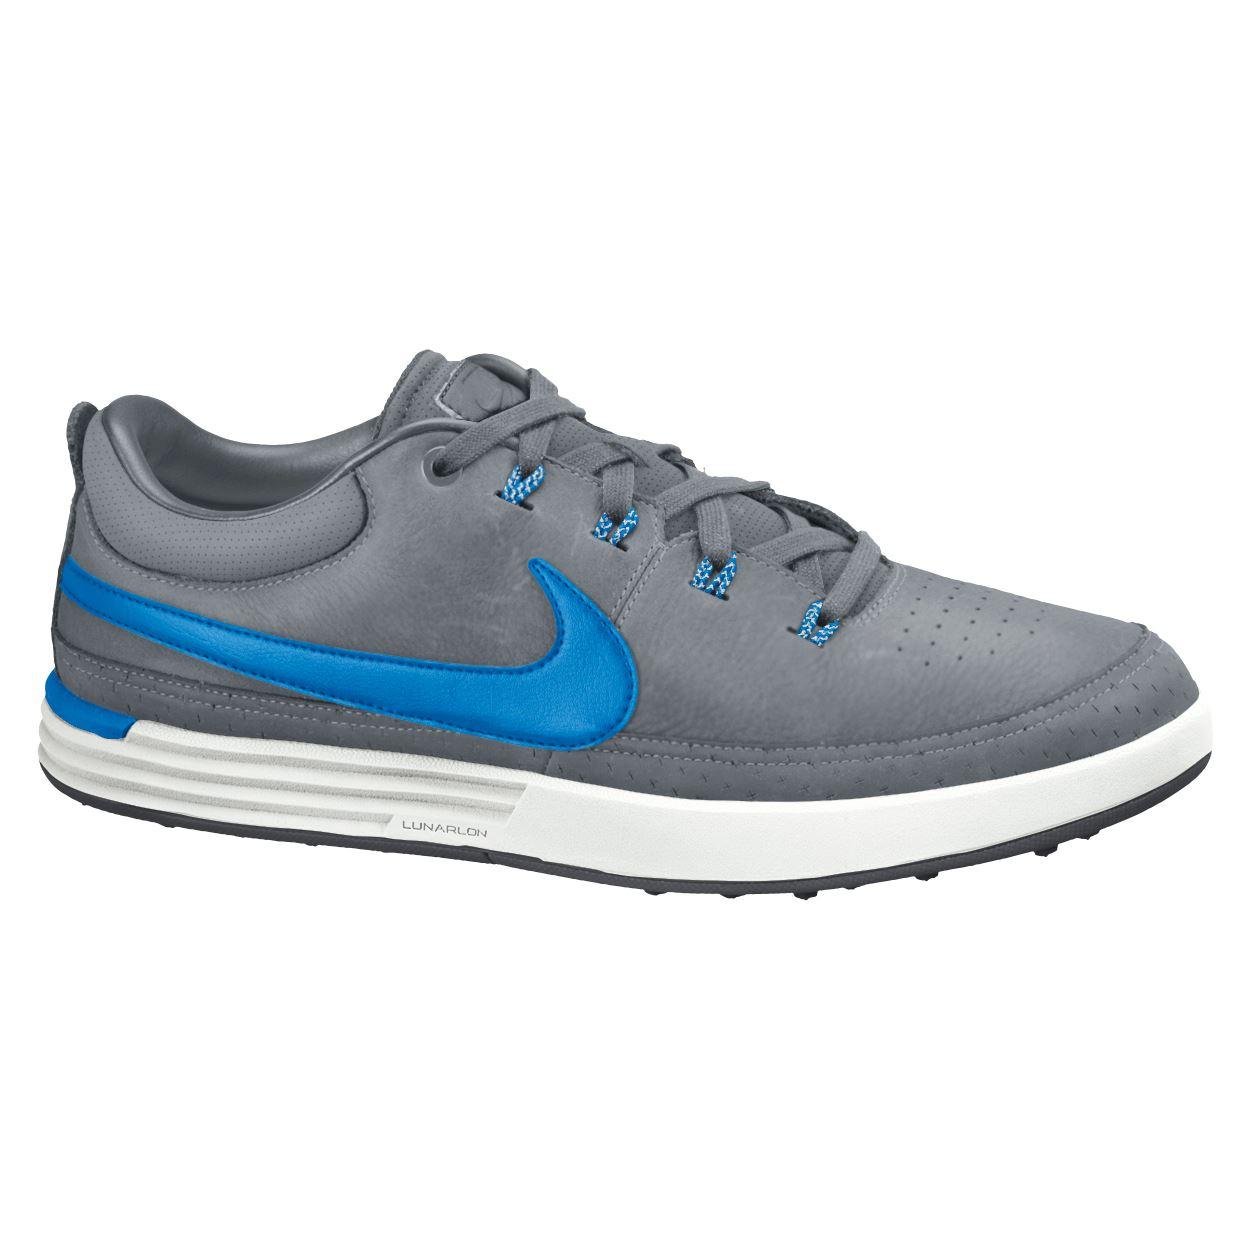 Nike Mens Golf Shoes Ebay